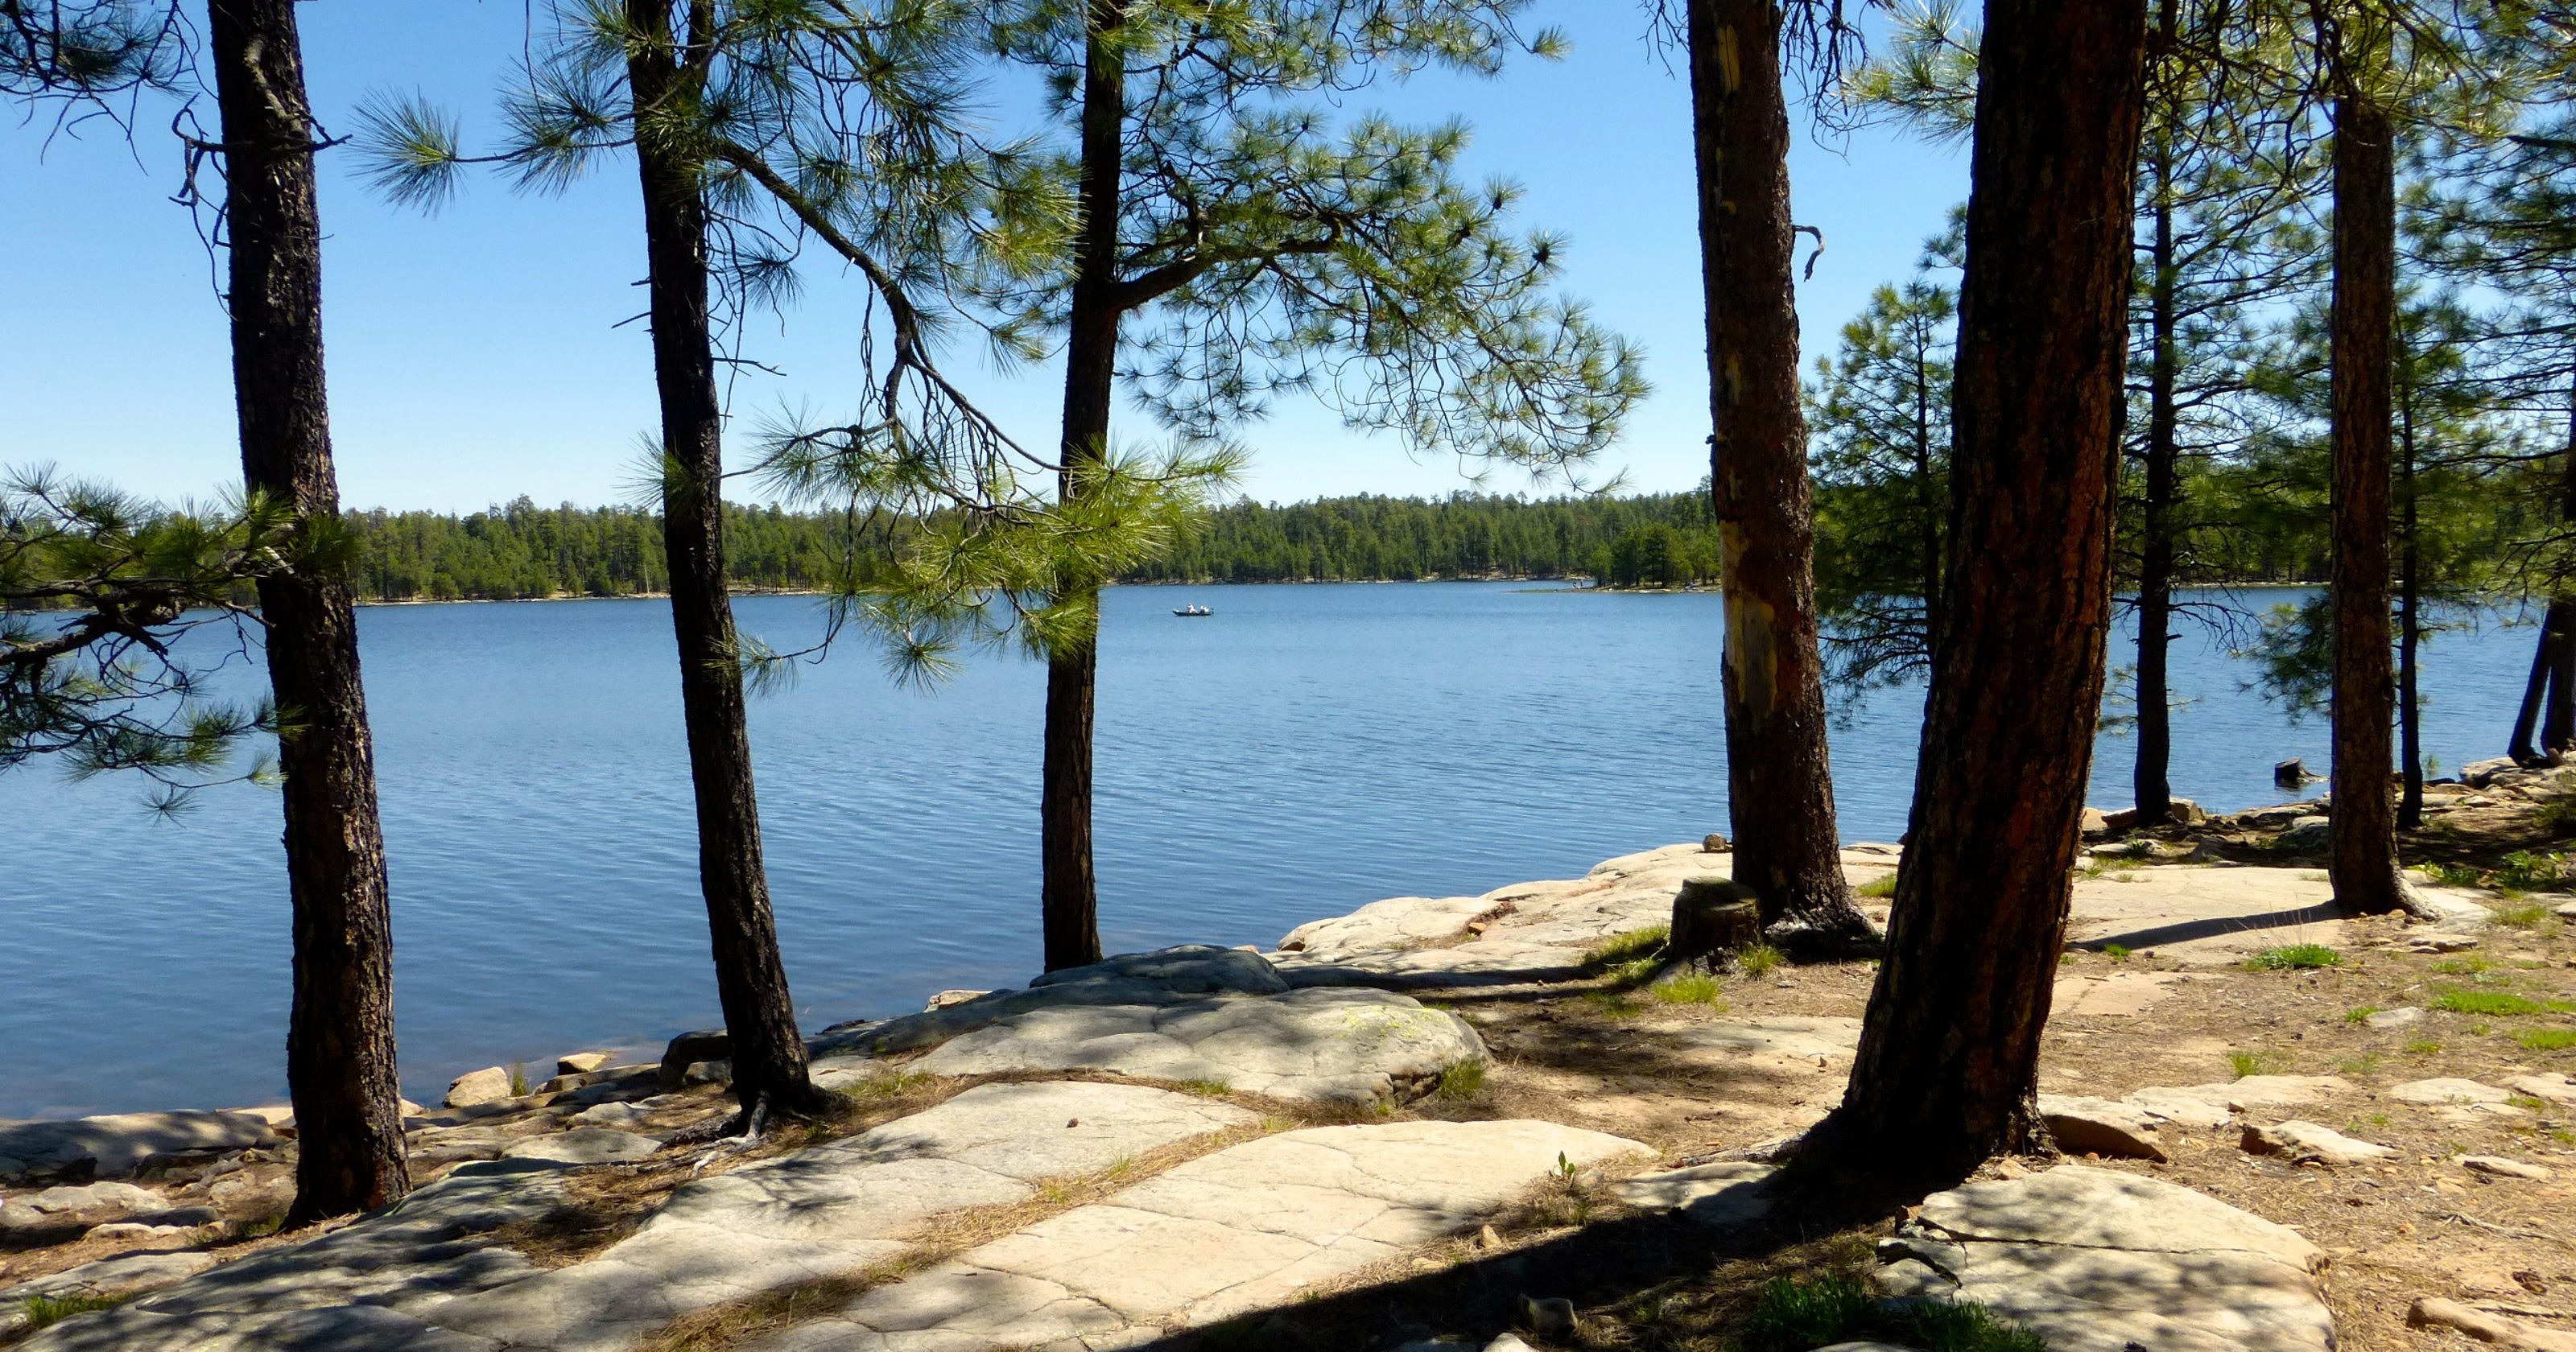 Payson, AZ: lakes for fishing, camping, hiking